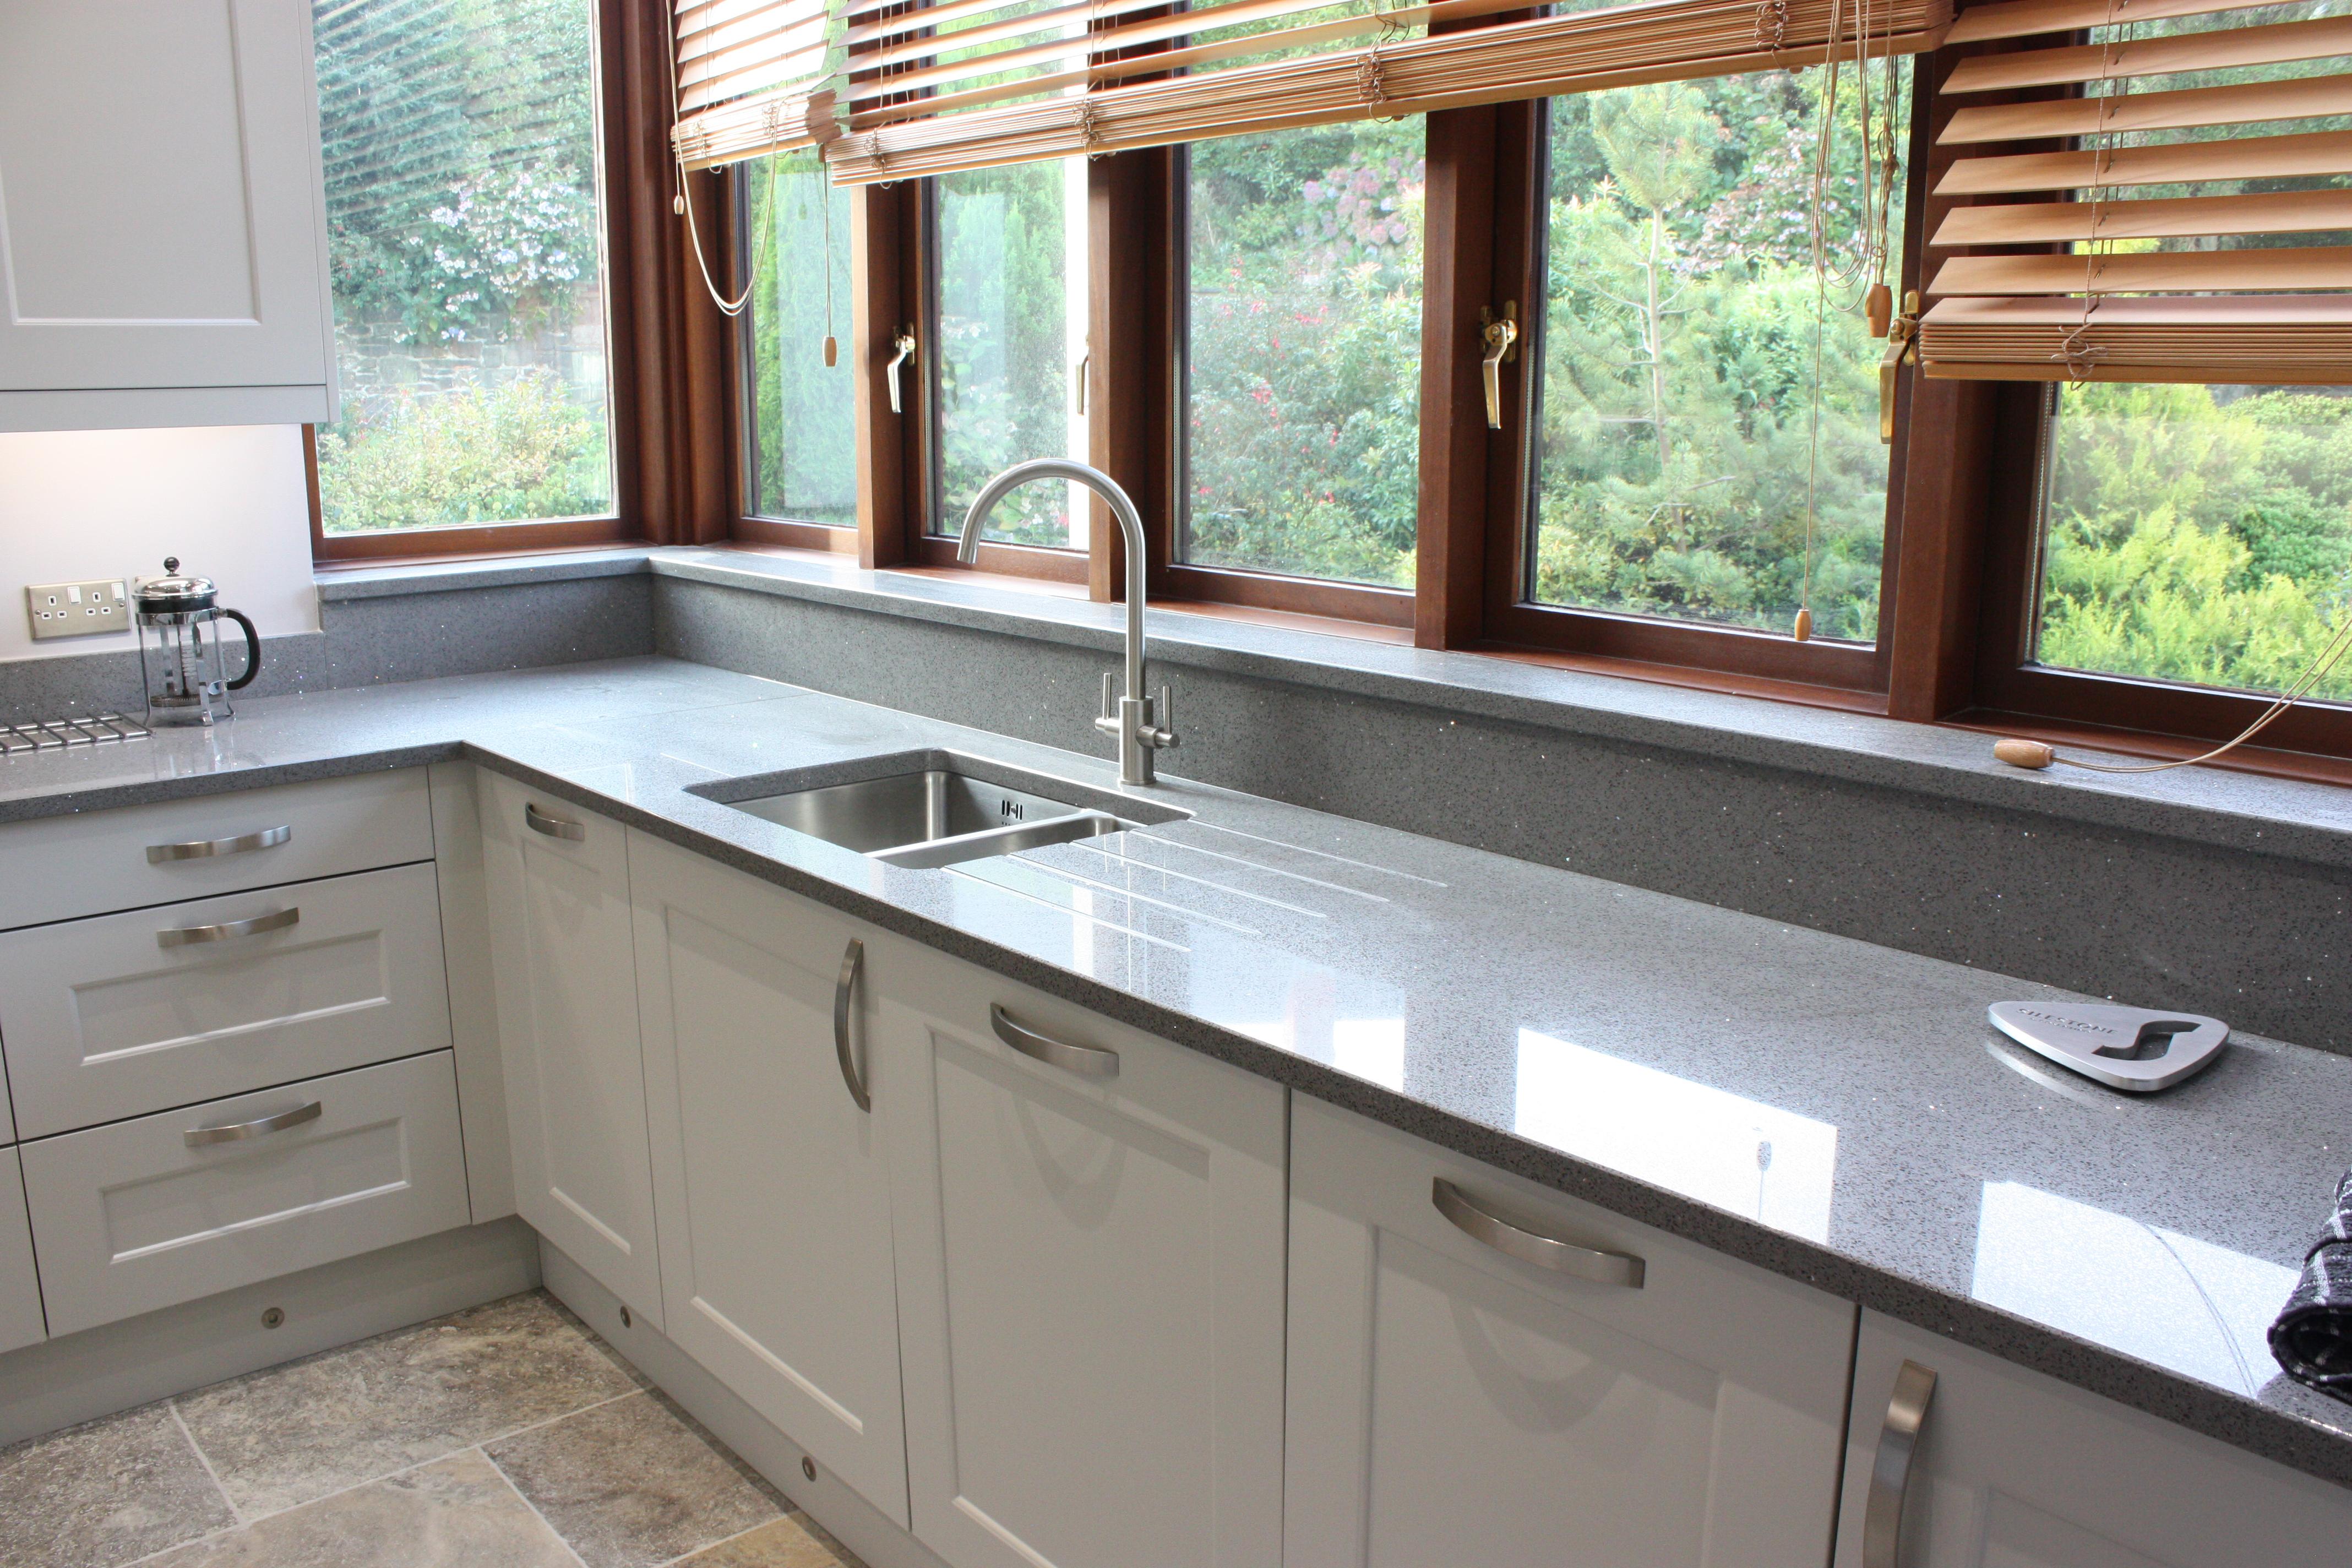 Kitchen-Stori-Florence-Light-Grey-Sink-Kitchen